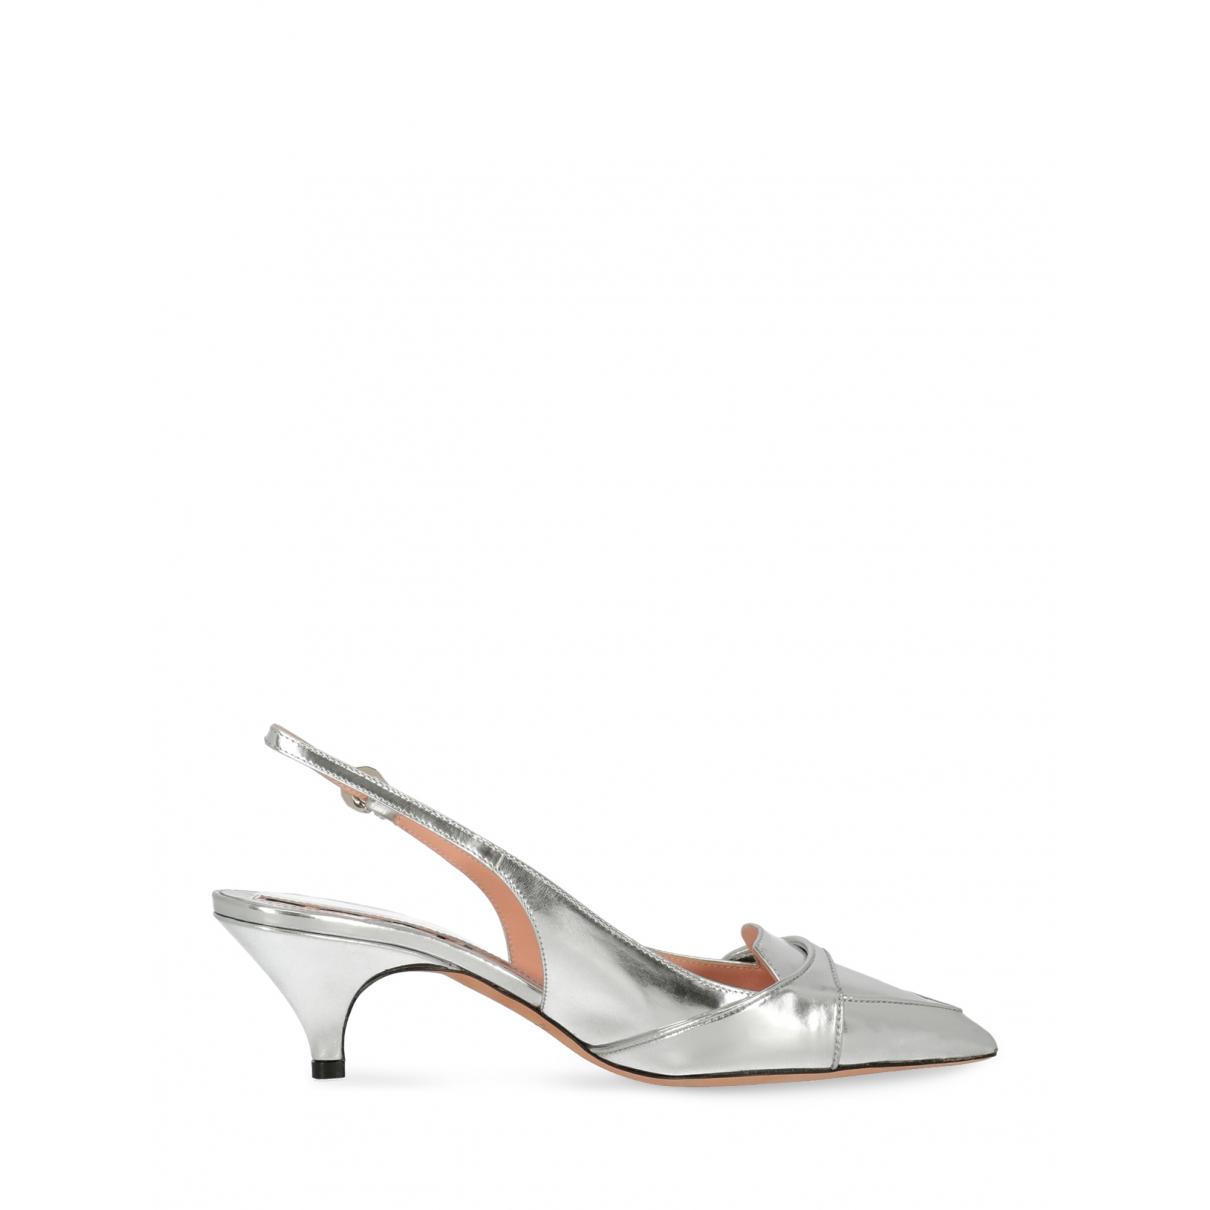 Rochas \N Silver Patent leather Heels for Women 36 IT